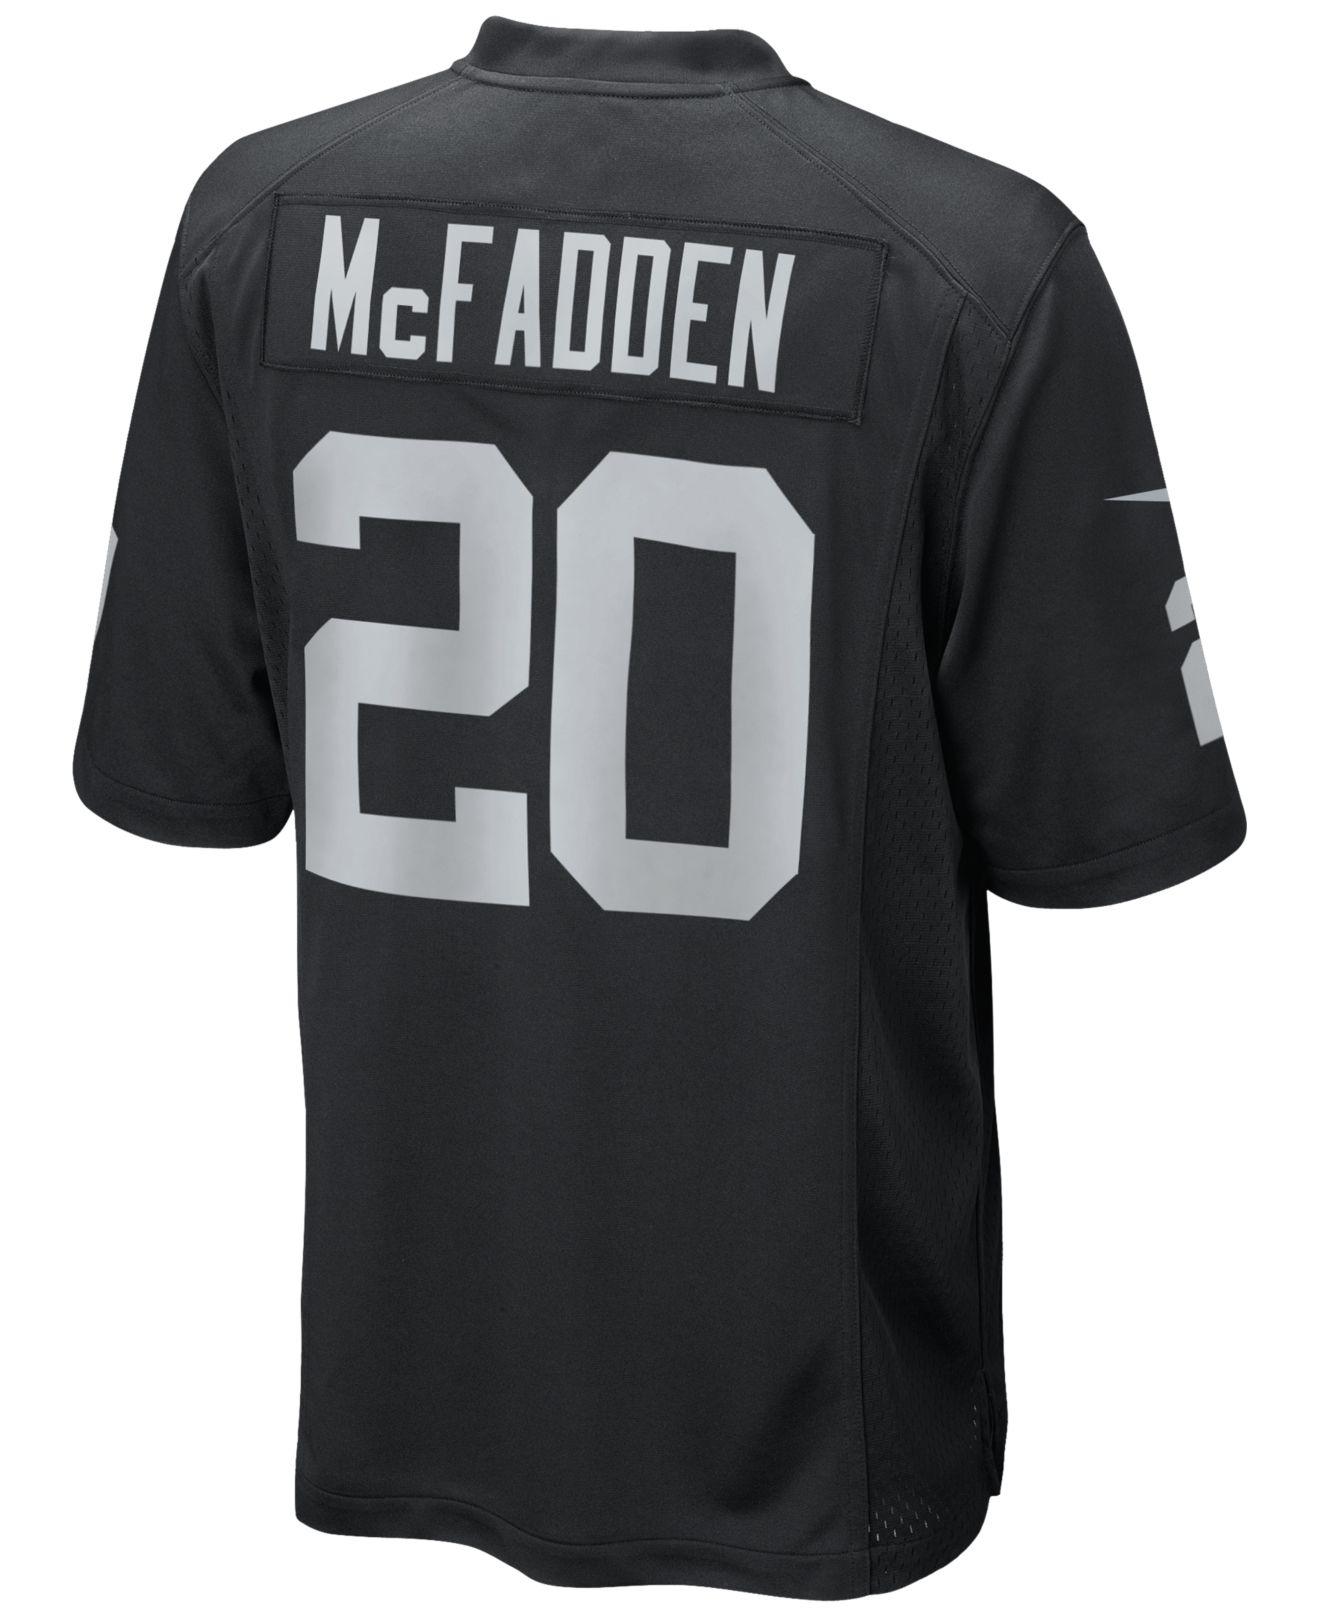 Nike Men's Darren Mcfadden Oakland Raiders Game Jersey in Black ...